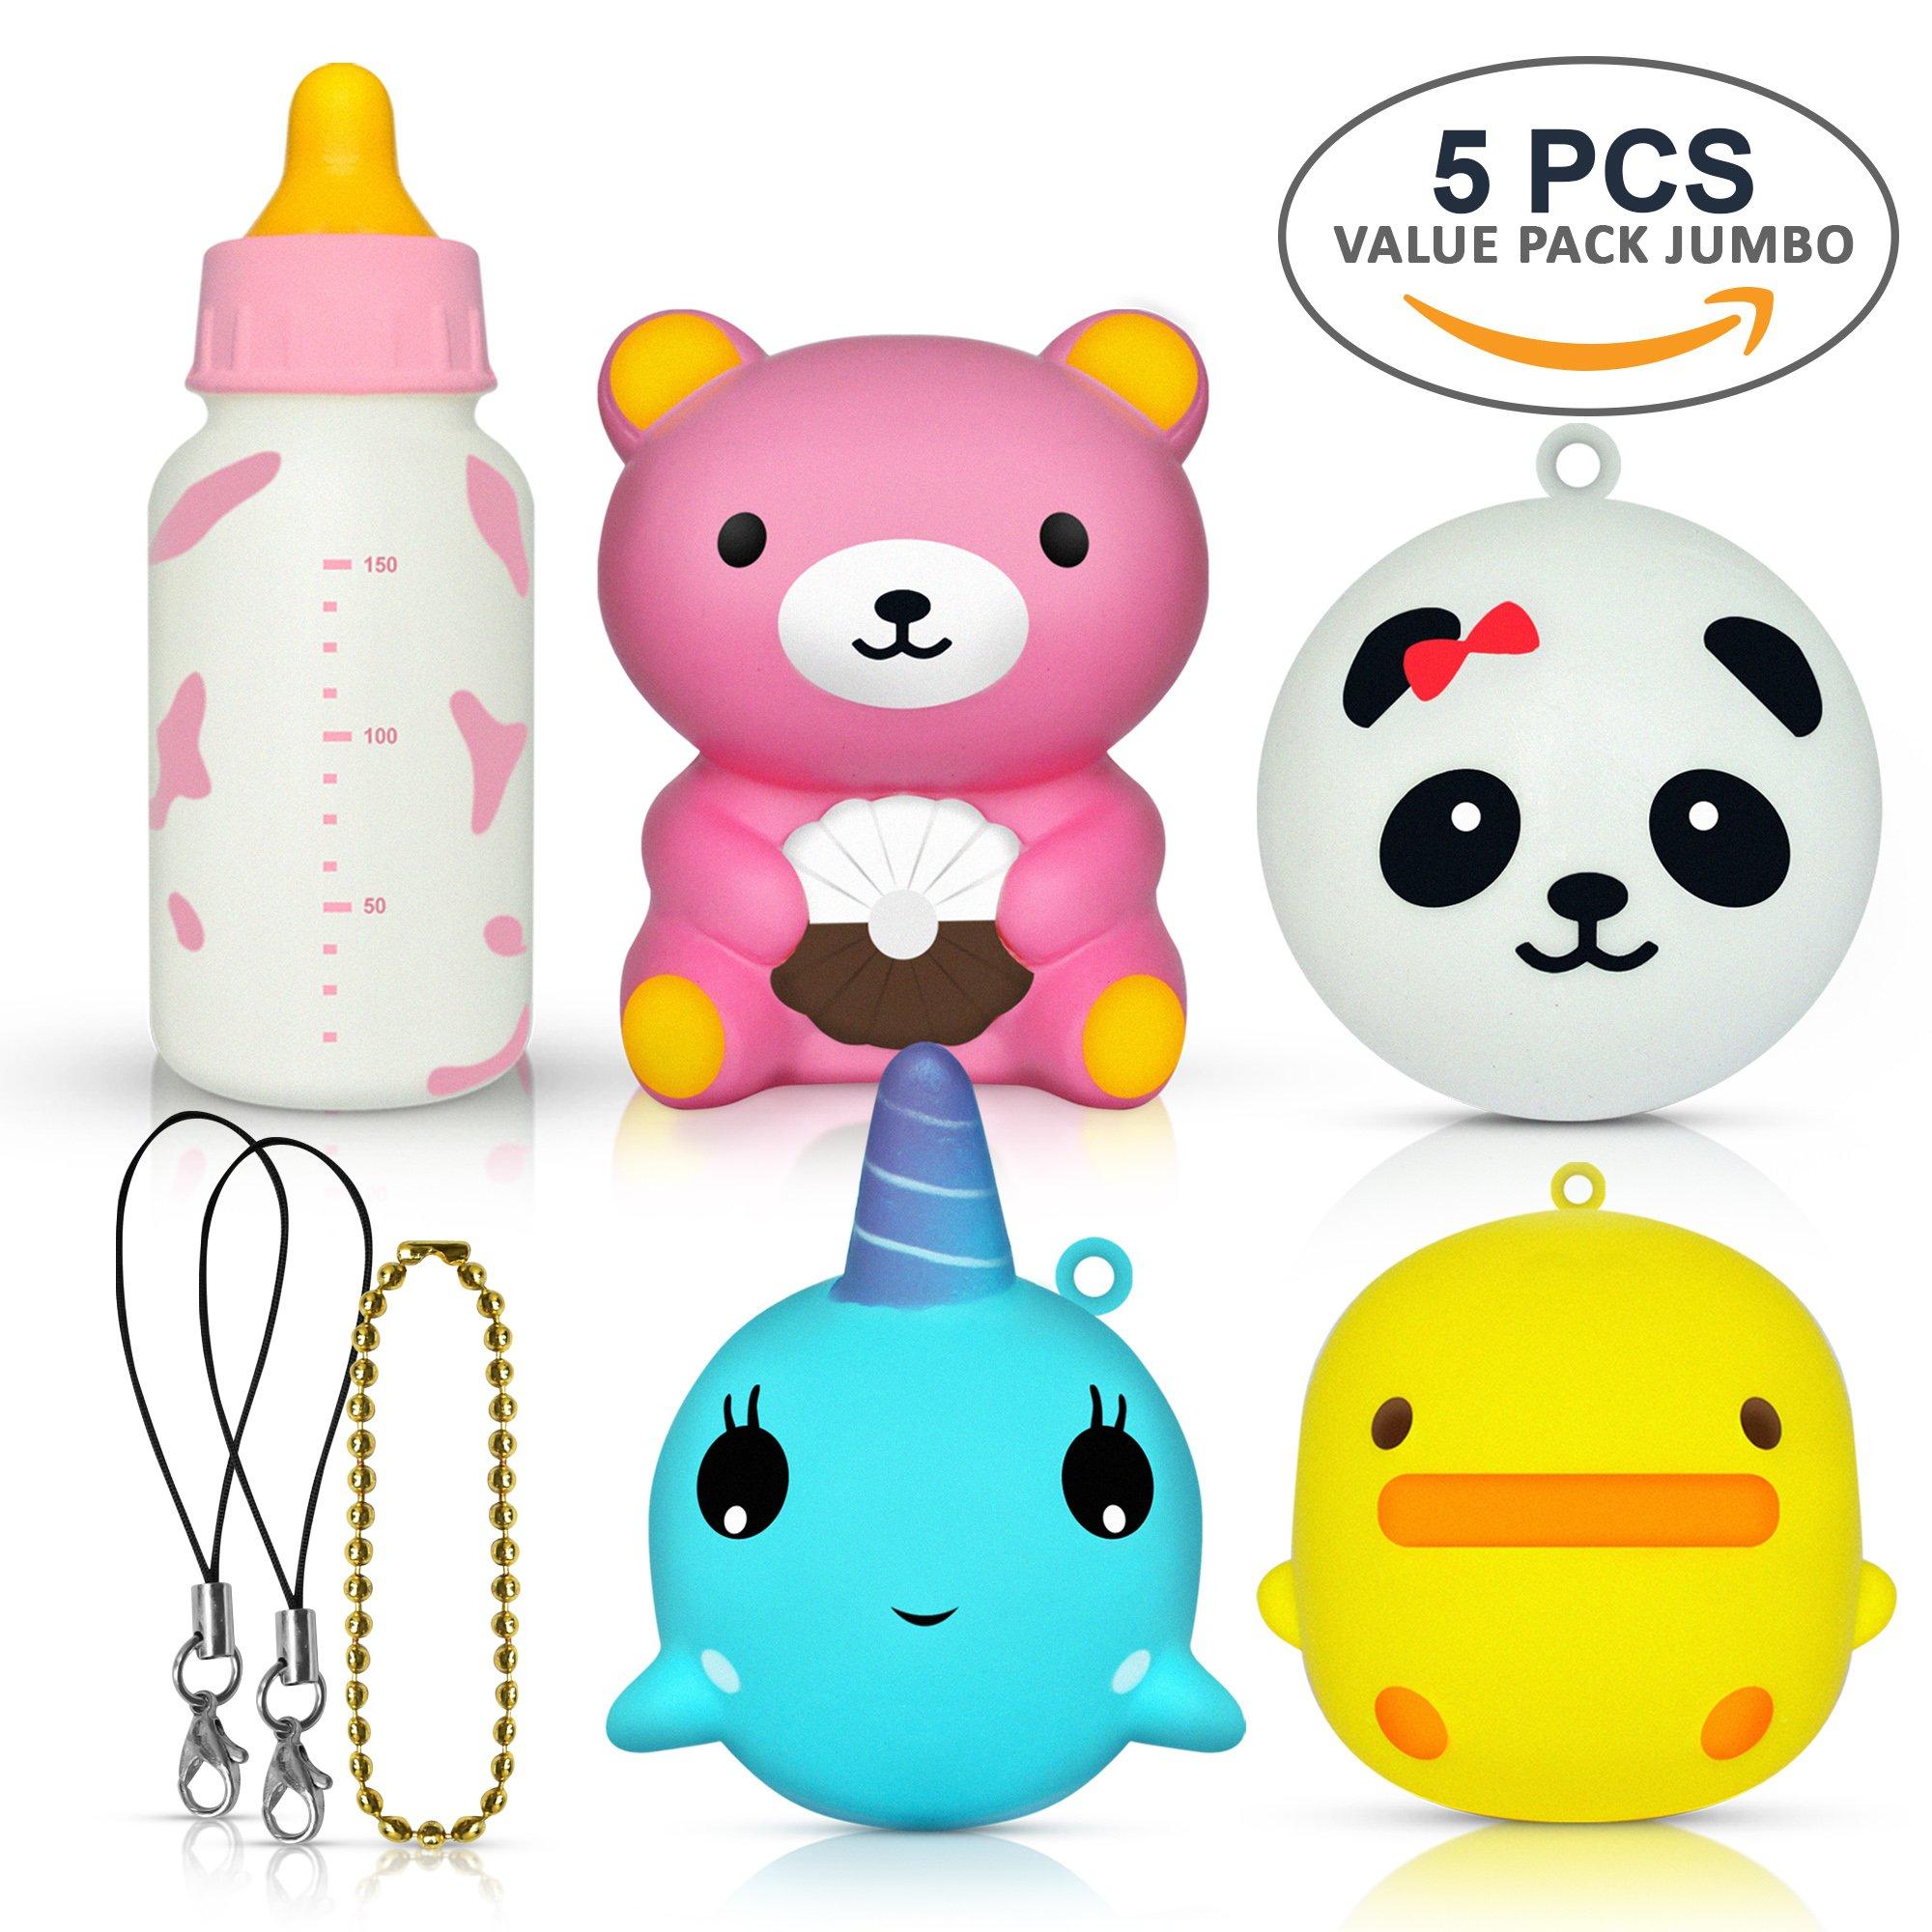 5 PCS Jumbo Squishies Value Pack – Super Cute Kawaii, Slow Rising, Animal Squishy Toys Set (Giant Bear, Panda, Whale, Chicken, Milk Bottle) Plus 3 Free Keychains. Fun for Kids, Teens & Adults.